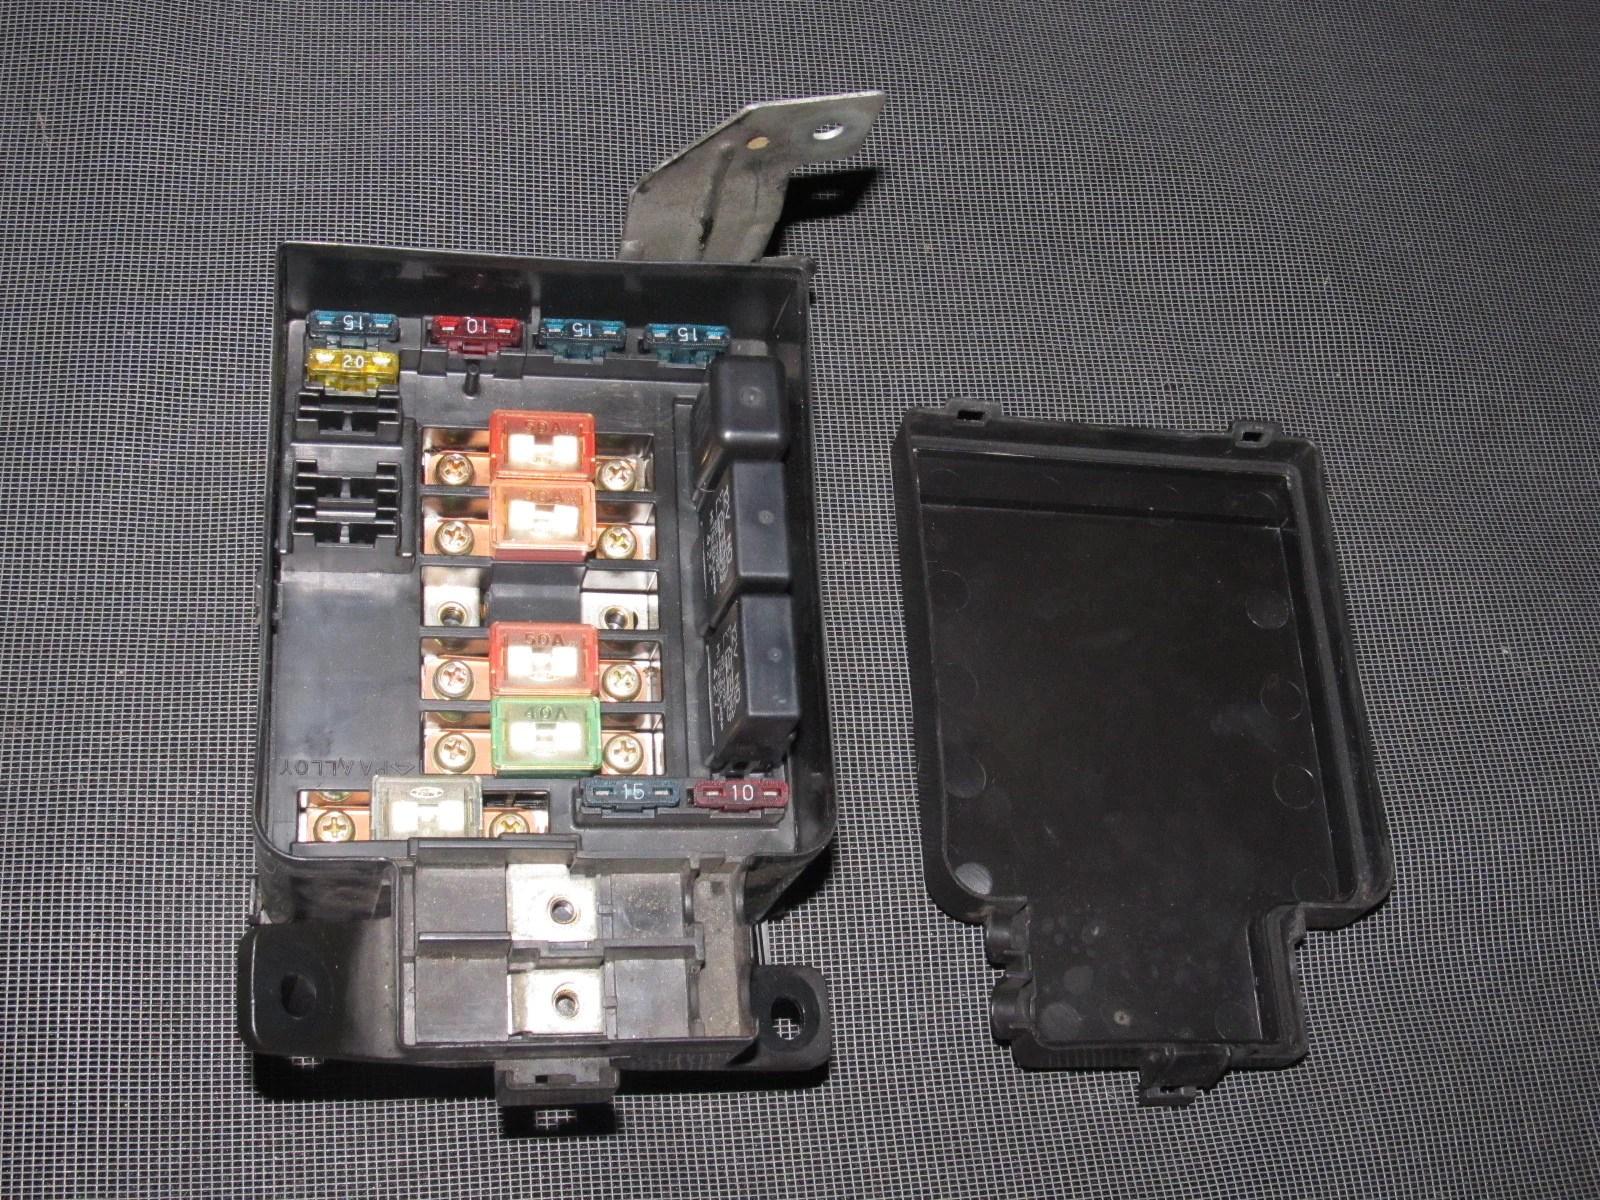 93 94 95 honda del sol oem b16 engine fuse box with relays  [ 1600 x 1200 Pixel ]